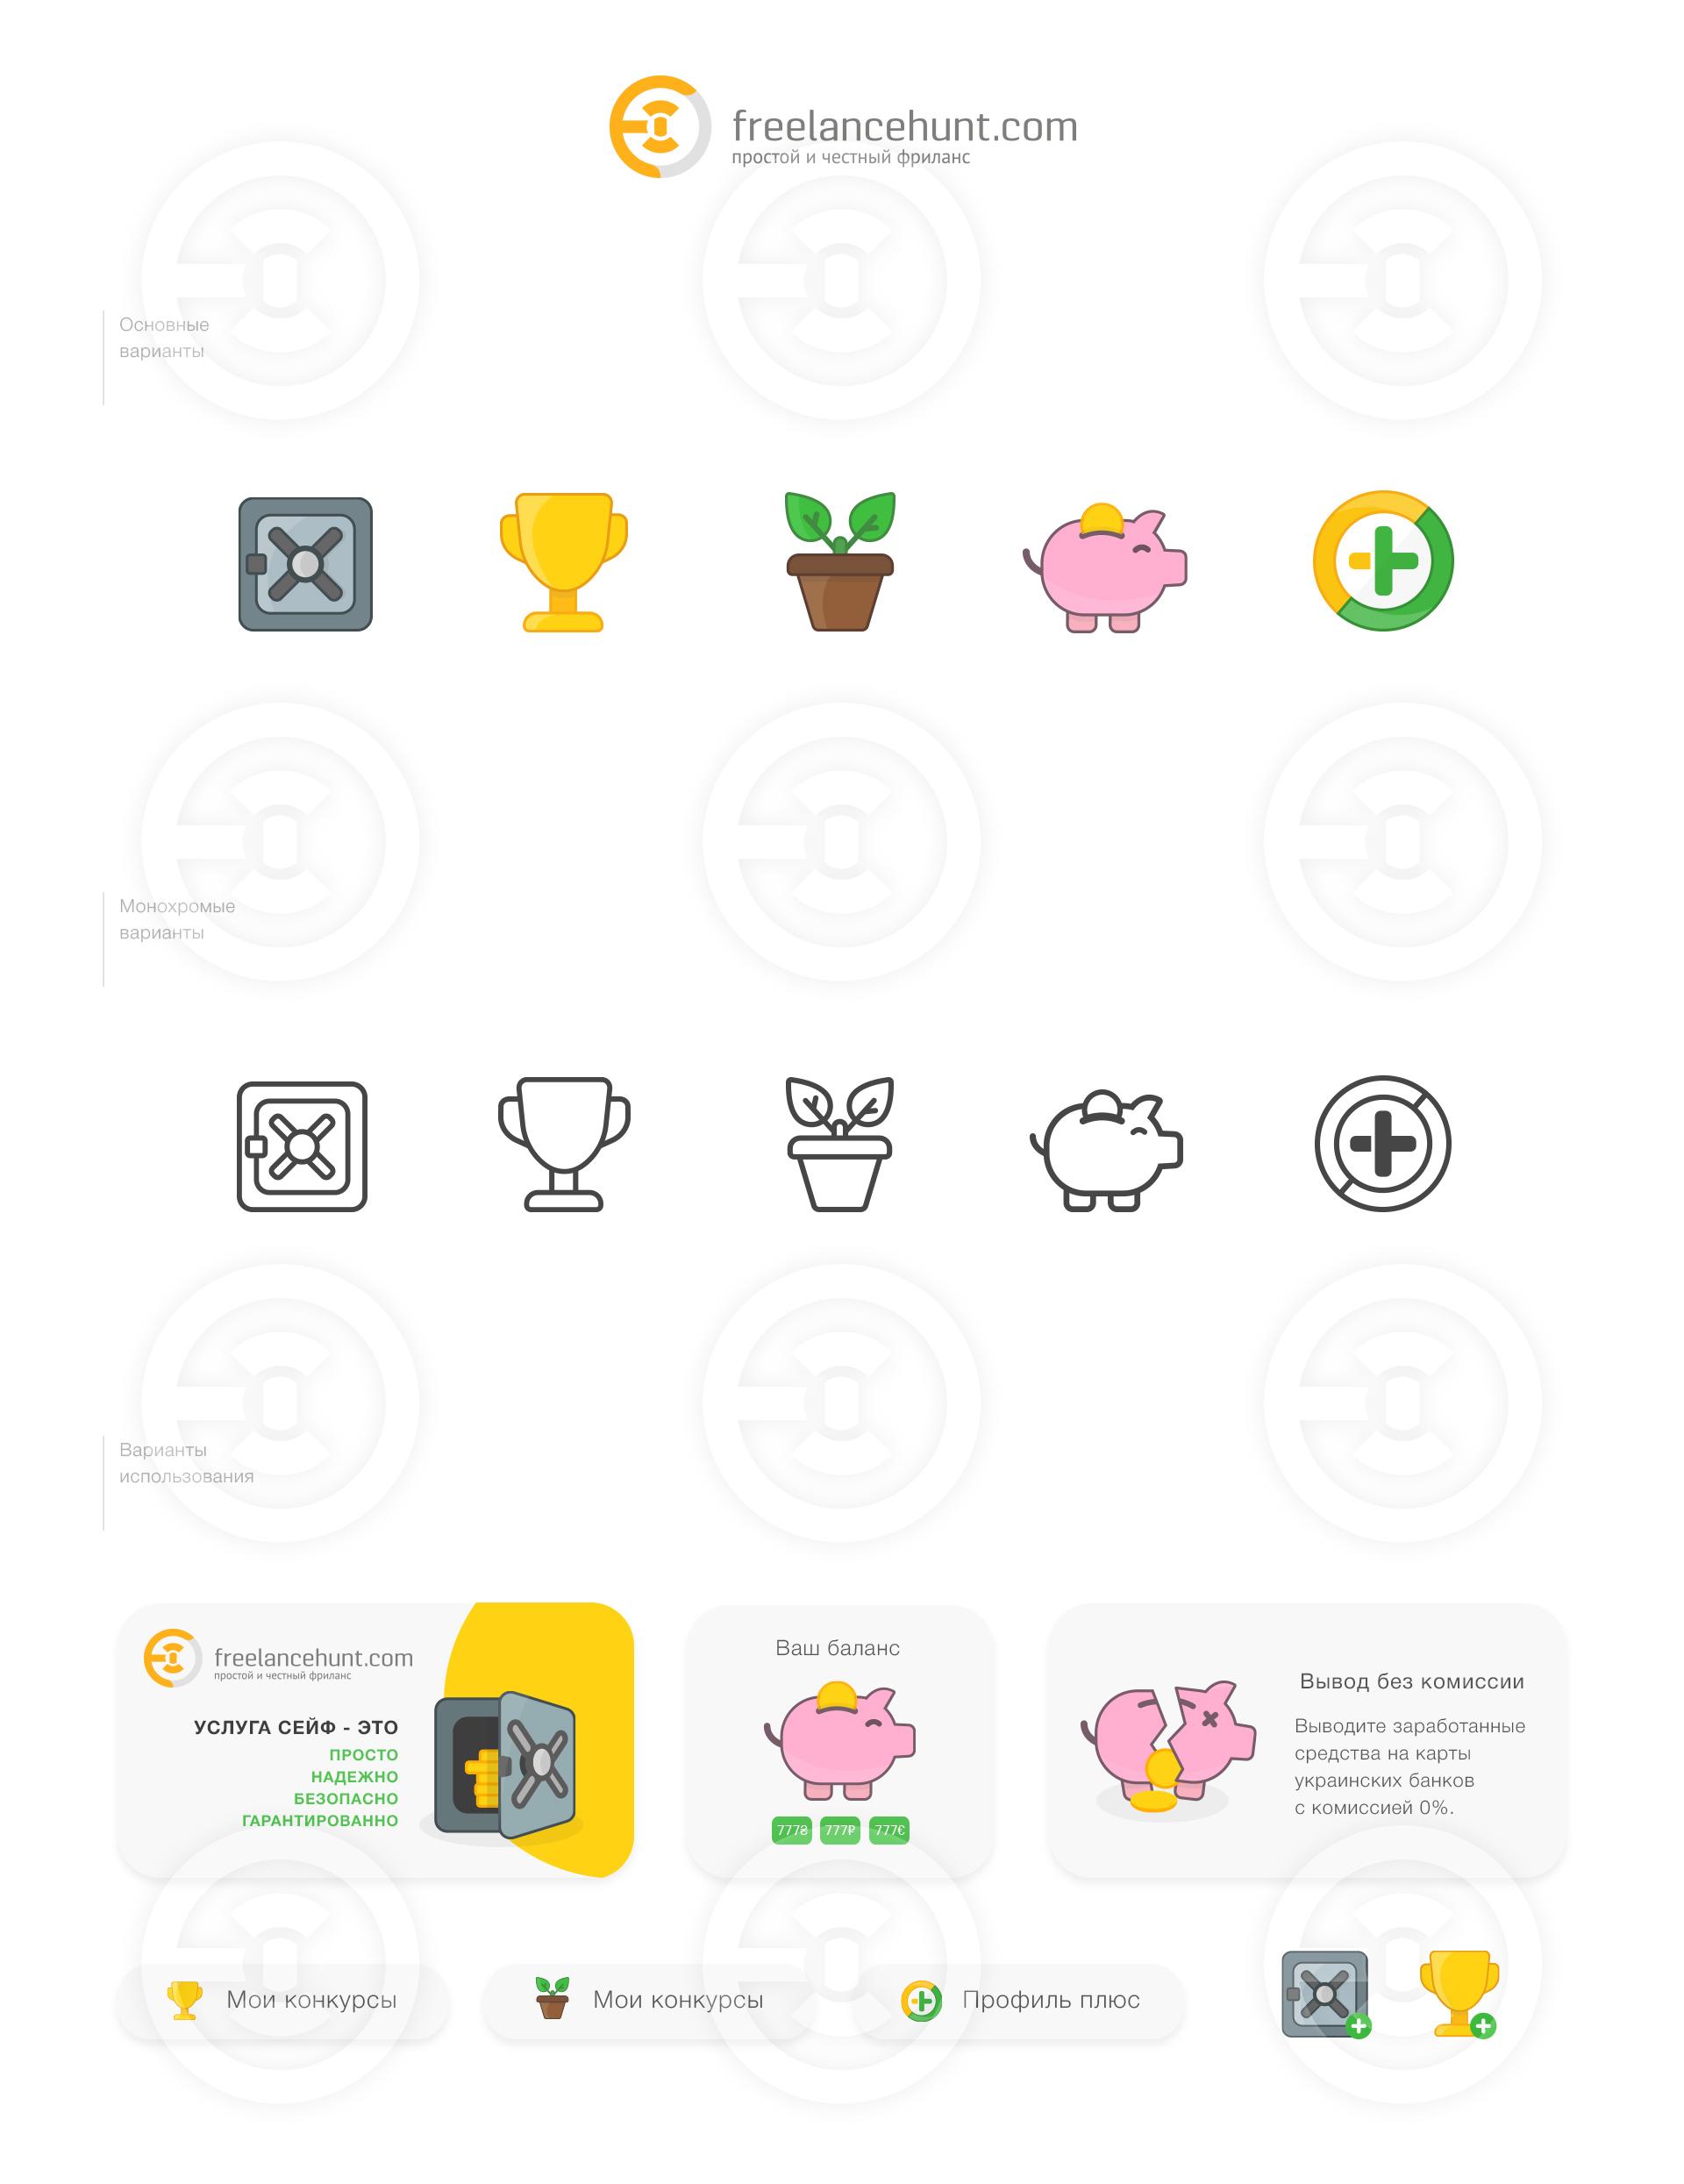 icons freelancehunt 2020 O4.jpg